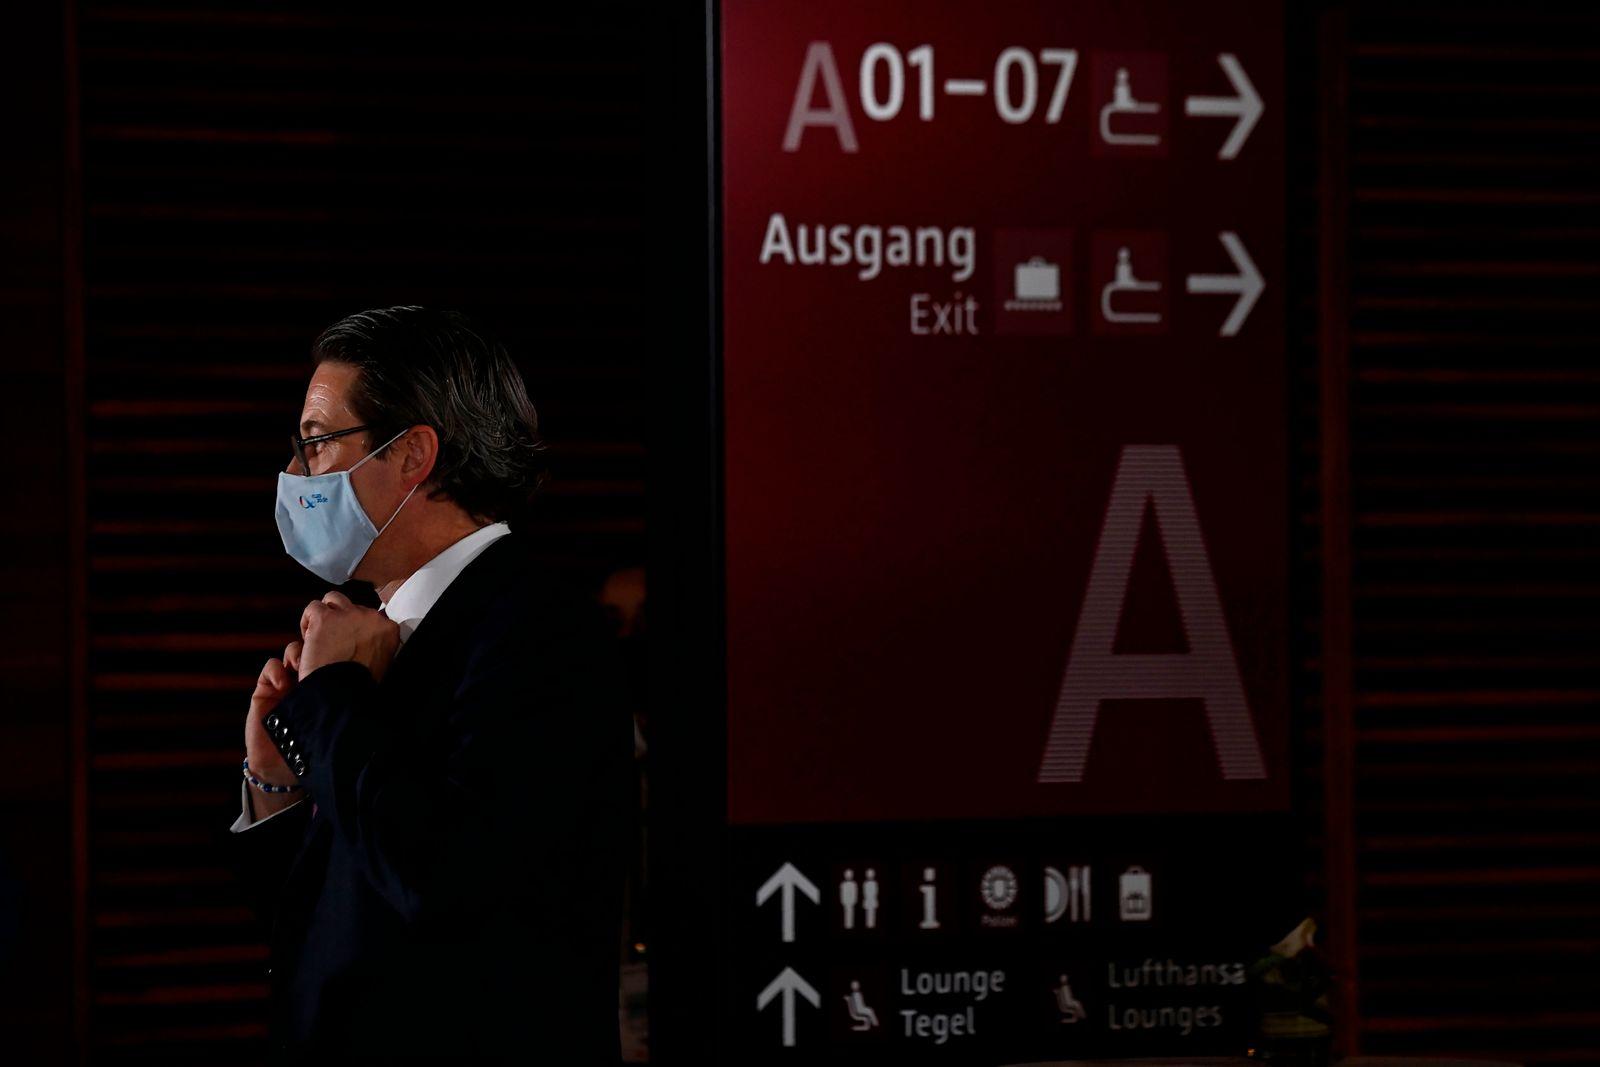 GERMANY-TRANSPORT-AVIATION-AIRPORT-AEROSPACE